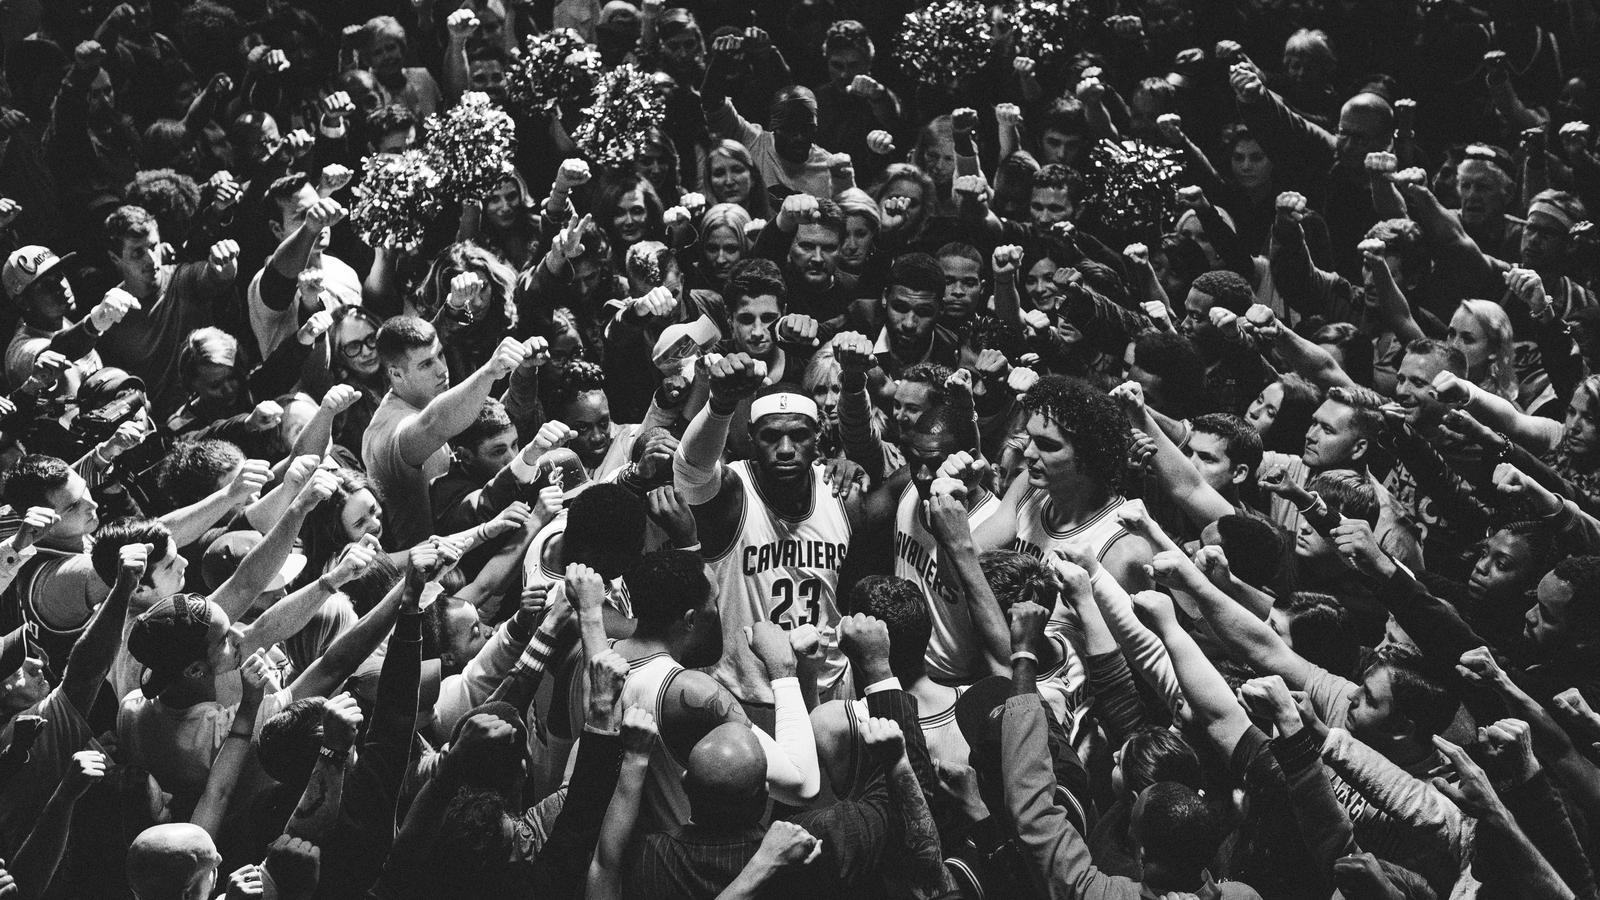 sátira Presunción Sospechar  Nike's inspiring Together video starring LeBron James